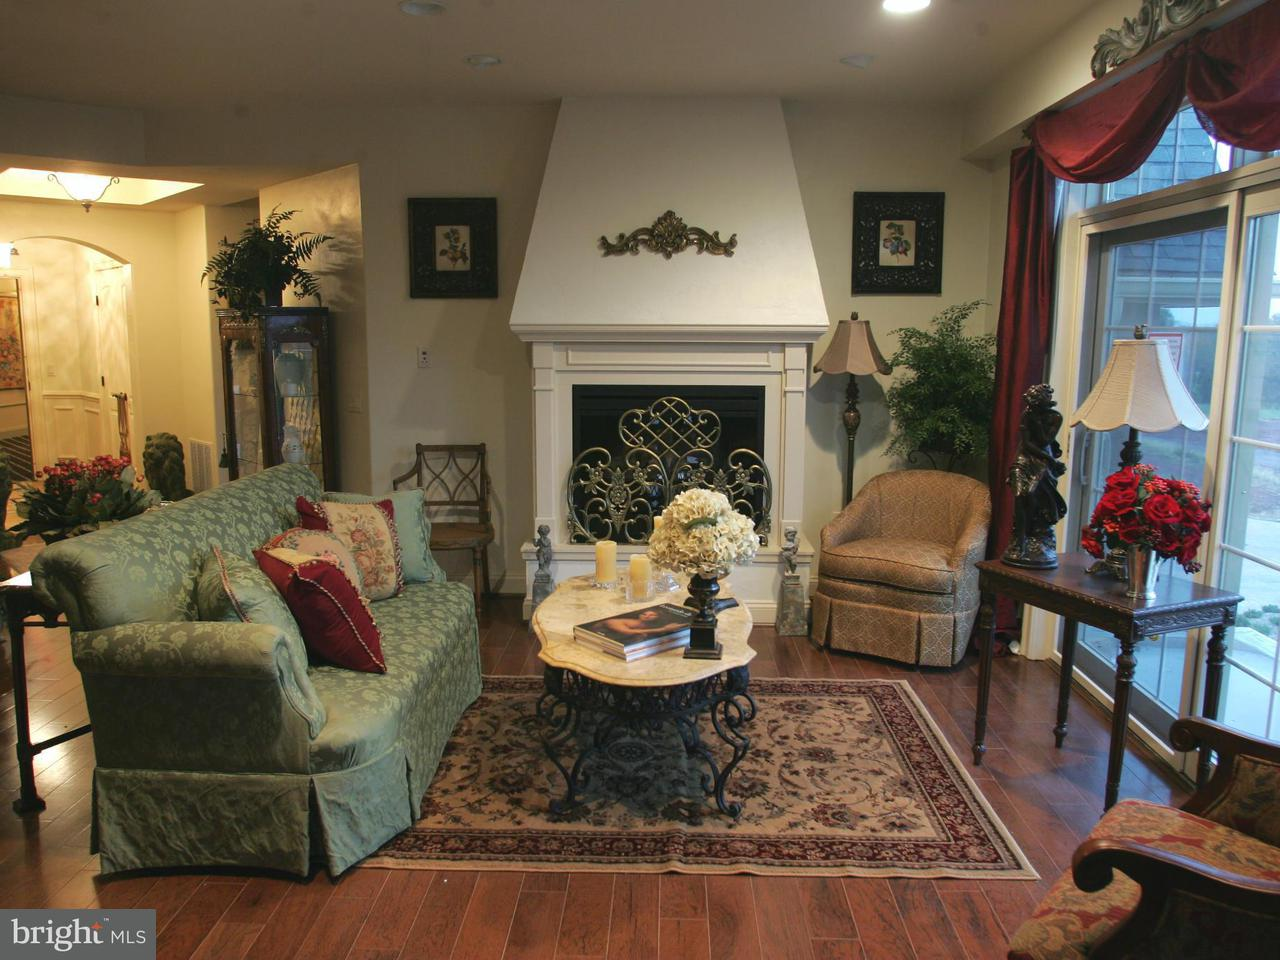 Additional photo for property listing at 220 SAVANNAH DR #203 220 SAVANNAH DR #203 Gettysburg, Pennsylvania 17325 Verenigde Staten